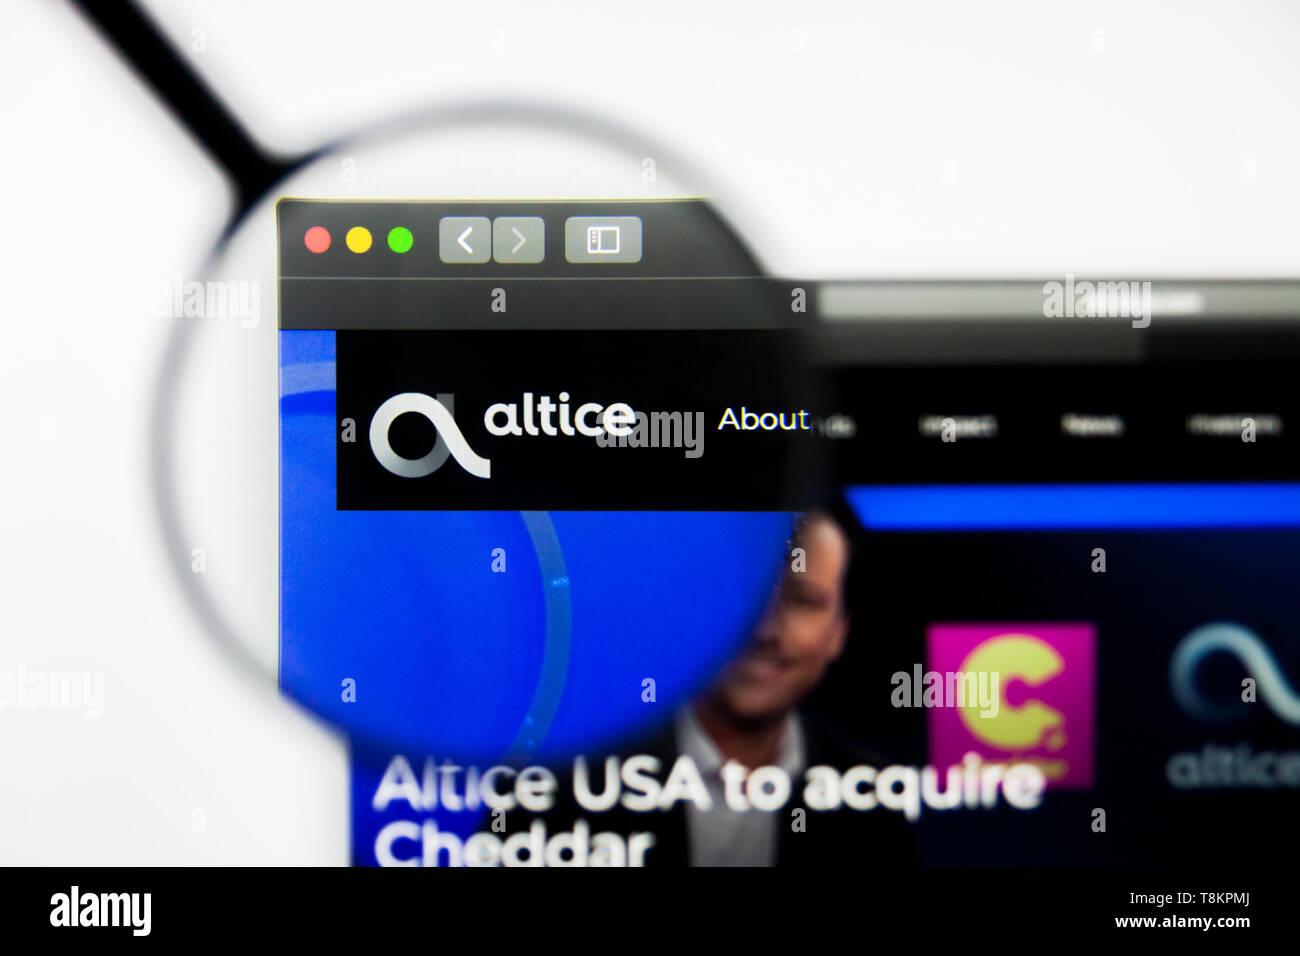 Richmond, Virginia, USA - 8 May 2019: Illustrative Editorial of Altice USA Inc website homepage. Altice USA Inc logo visible on screen. Stock Photo